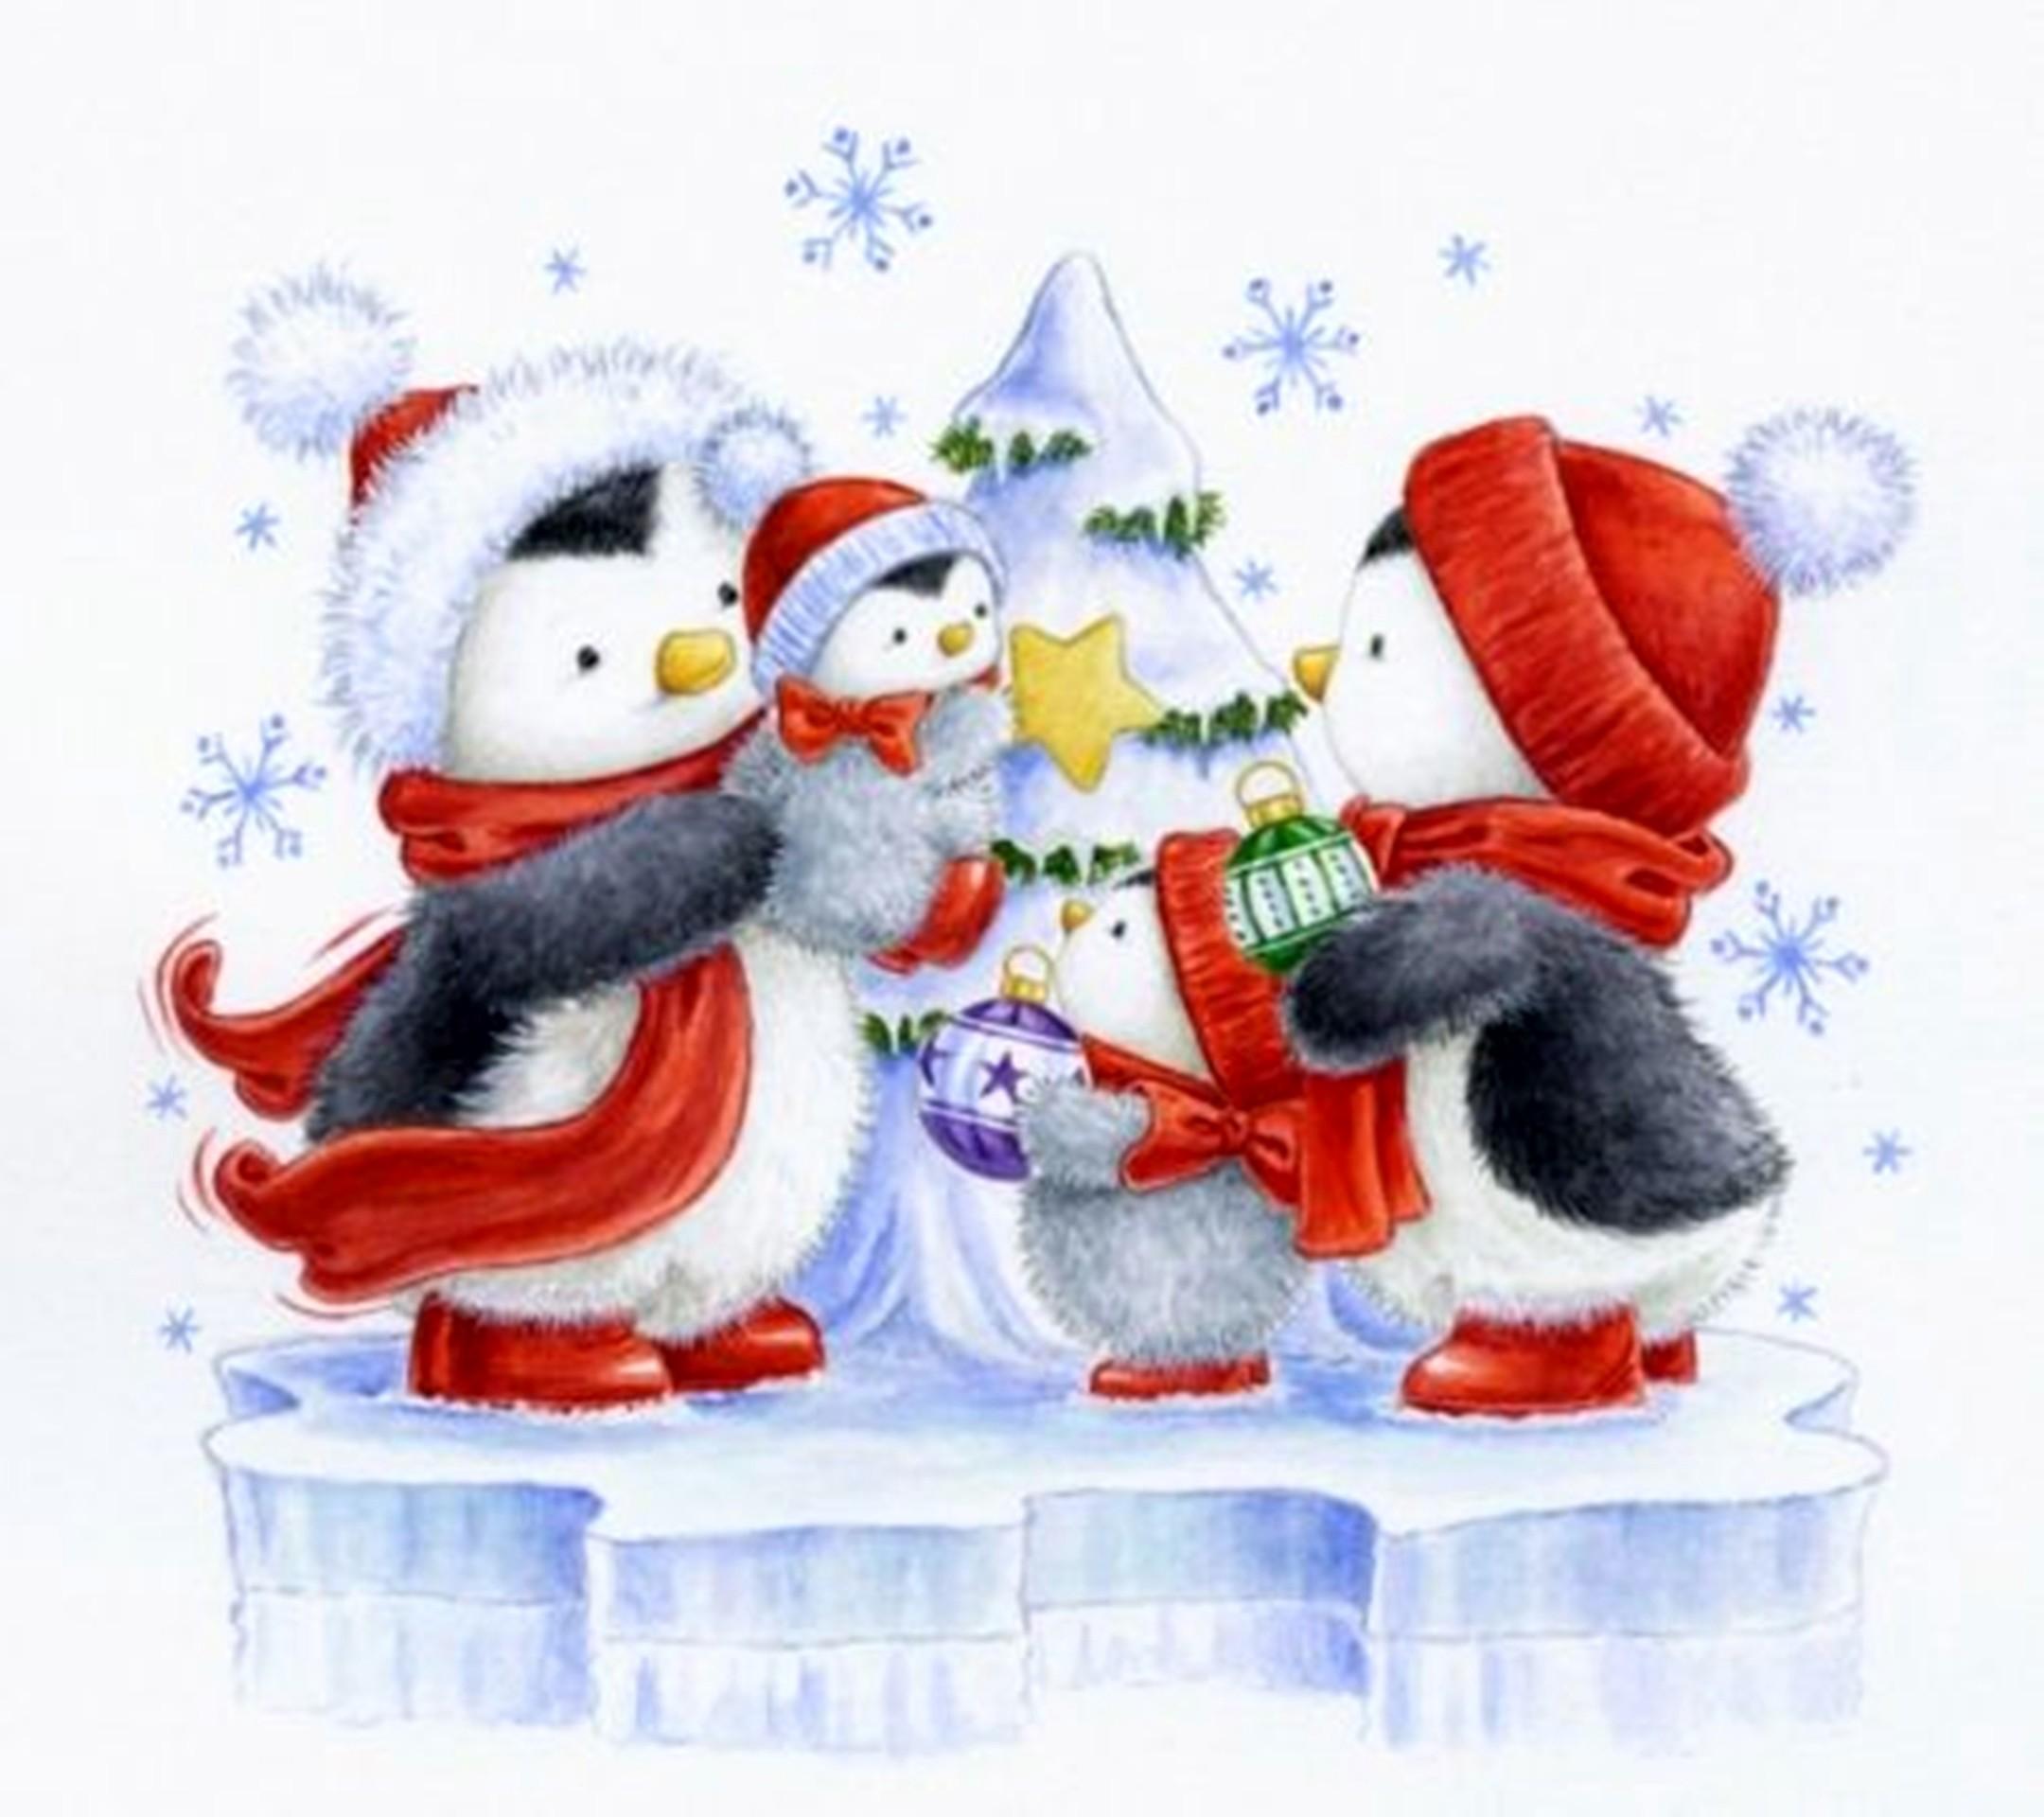 Christmas Wallpaper Drop (1)